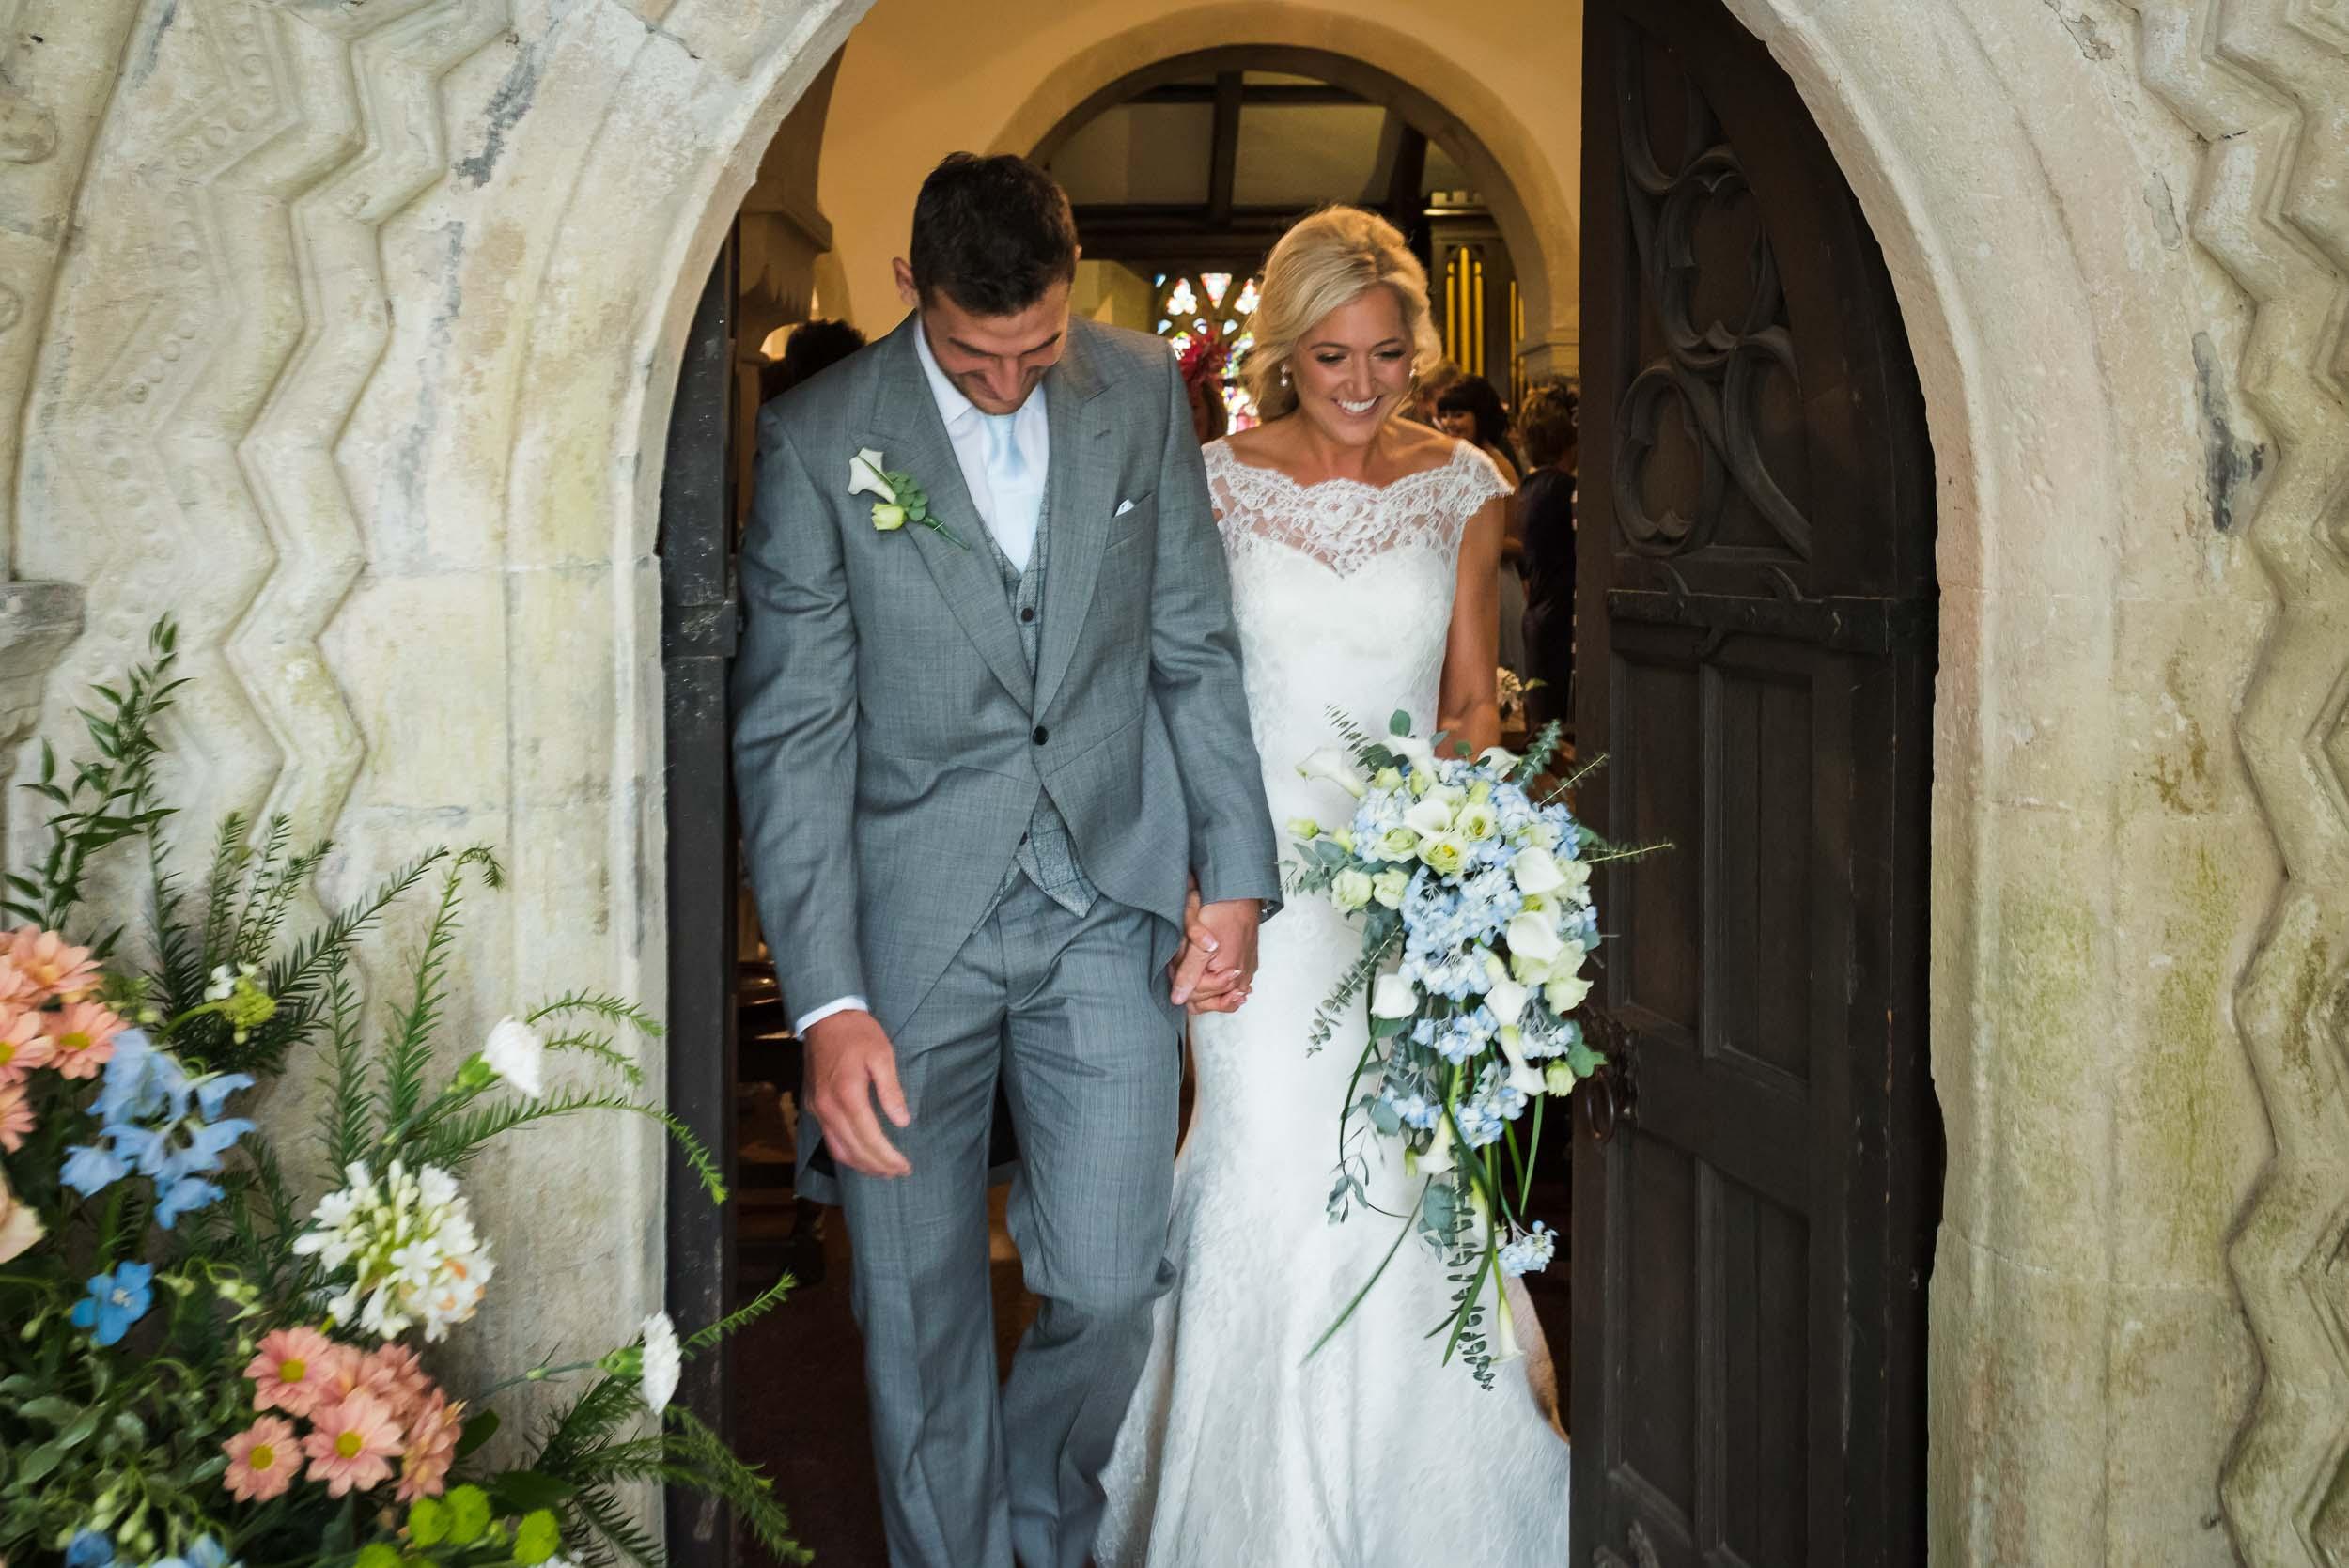 NC-20170722-sophie-and-jonny-wedding-1361.jpg